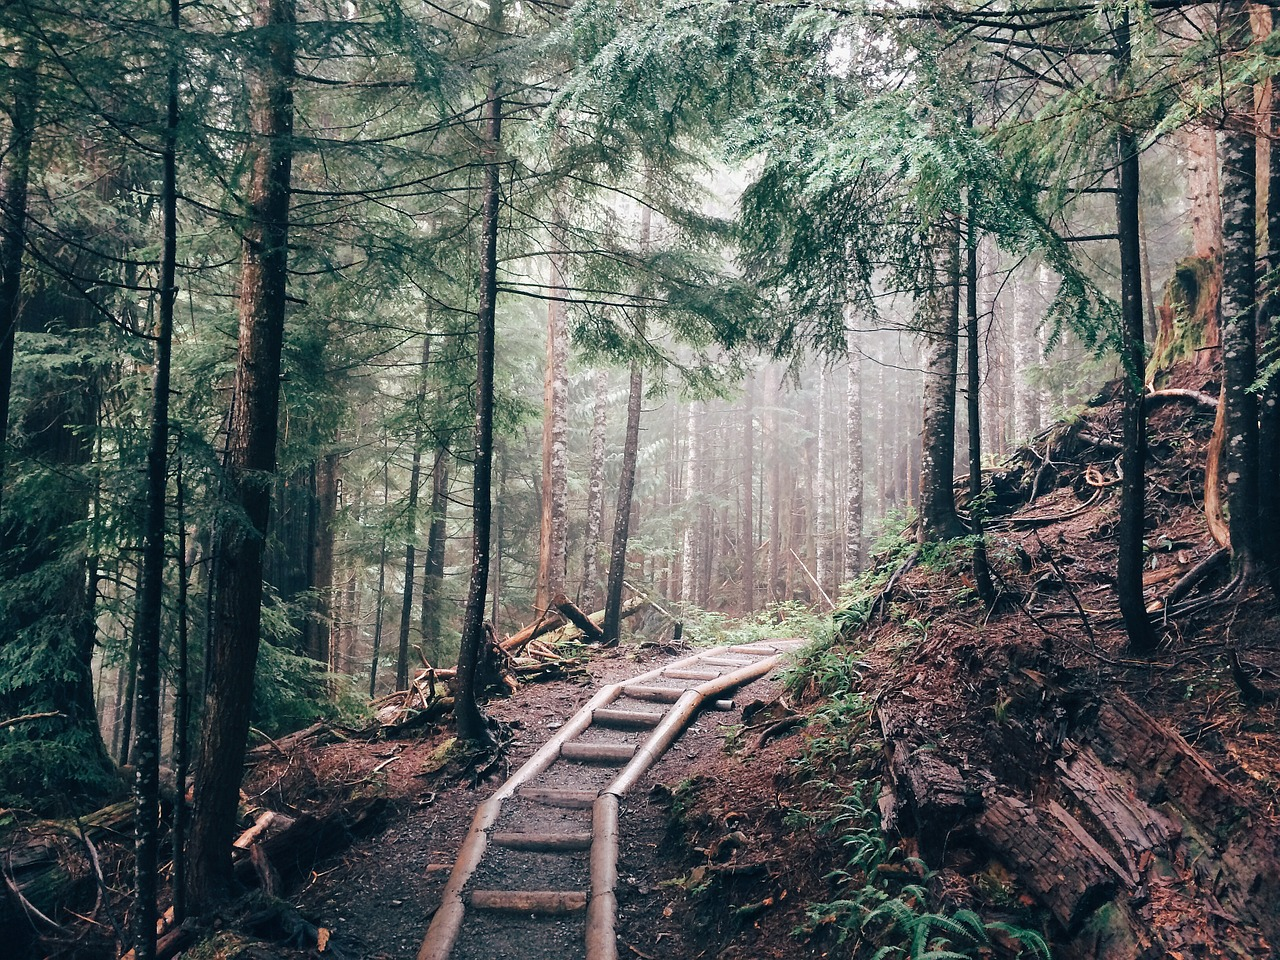 hiking-598203_1280